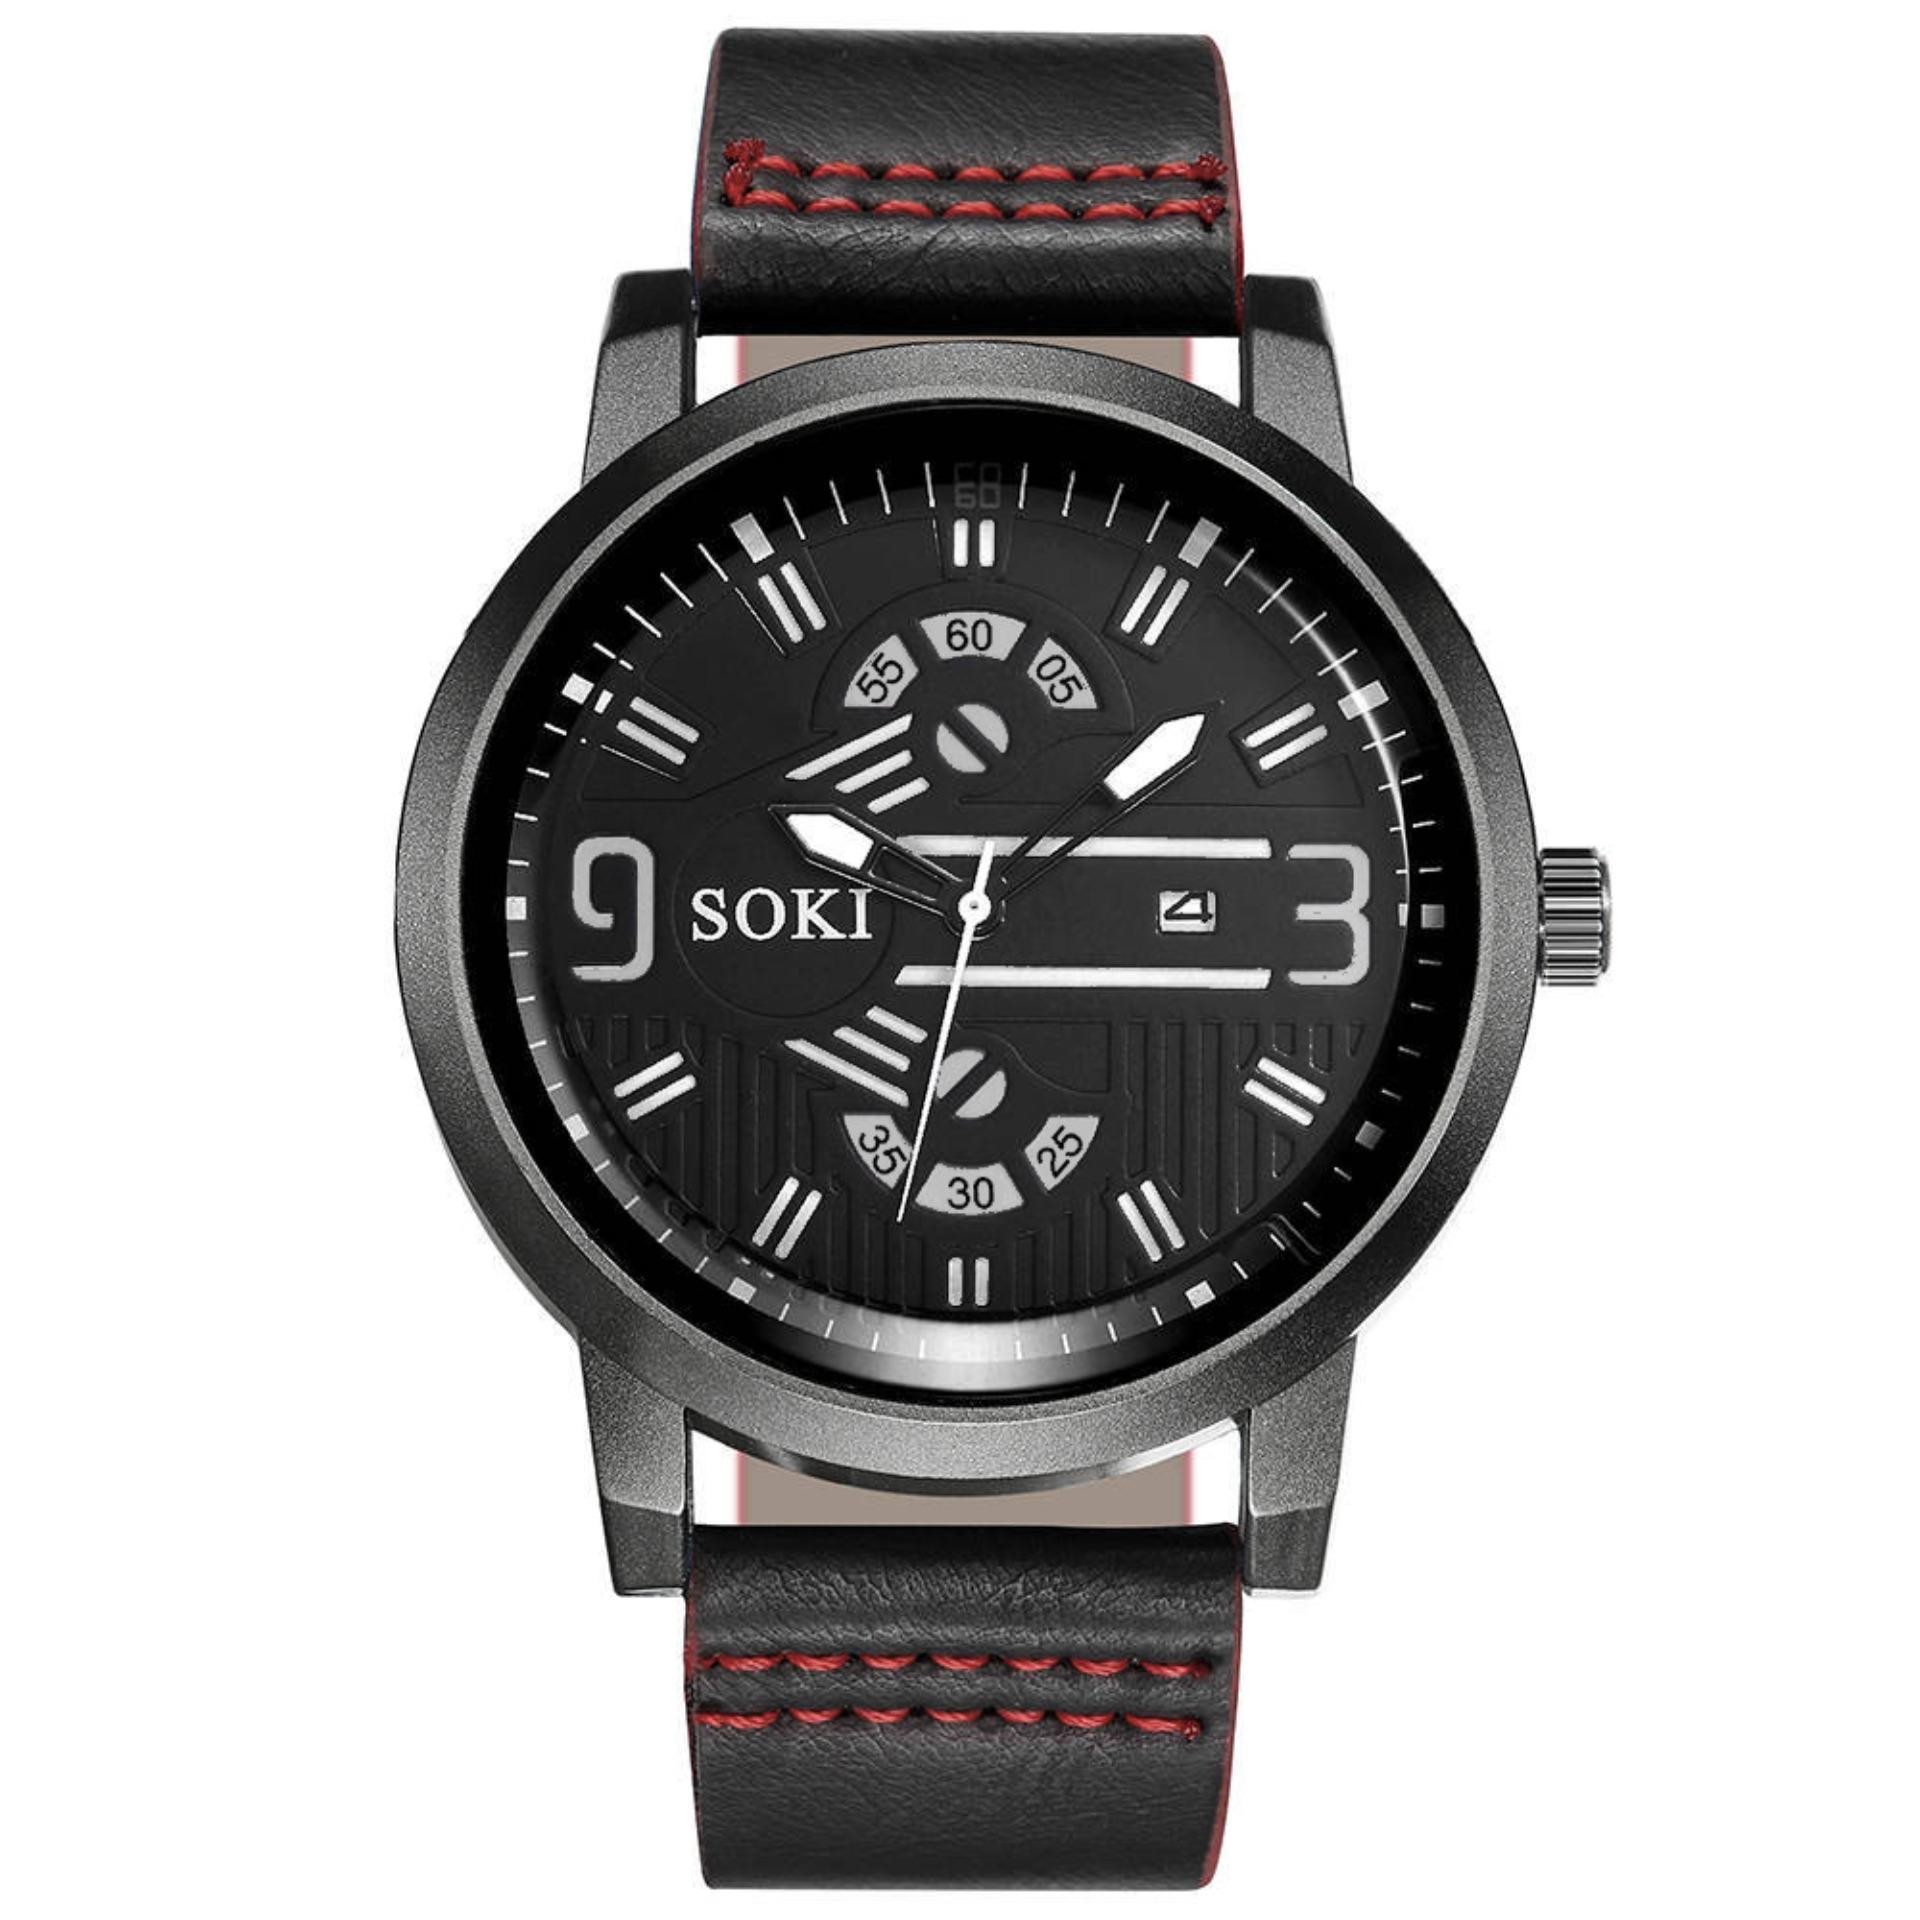 SOKI NAUTILUS - Jam tangan pria arloji pria sporty men's watch - FREE GIFT BOX